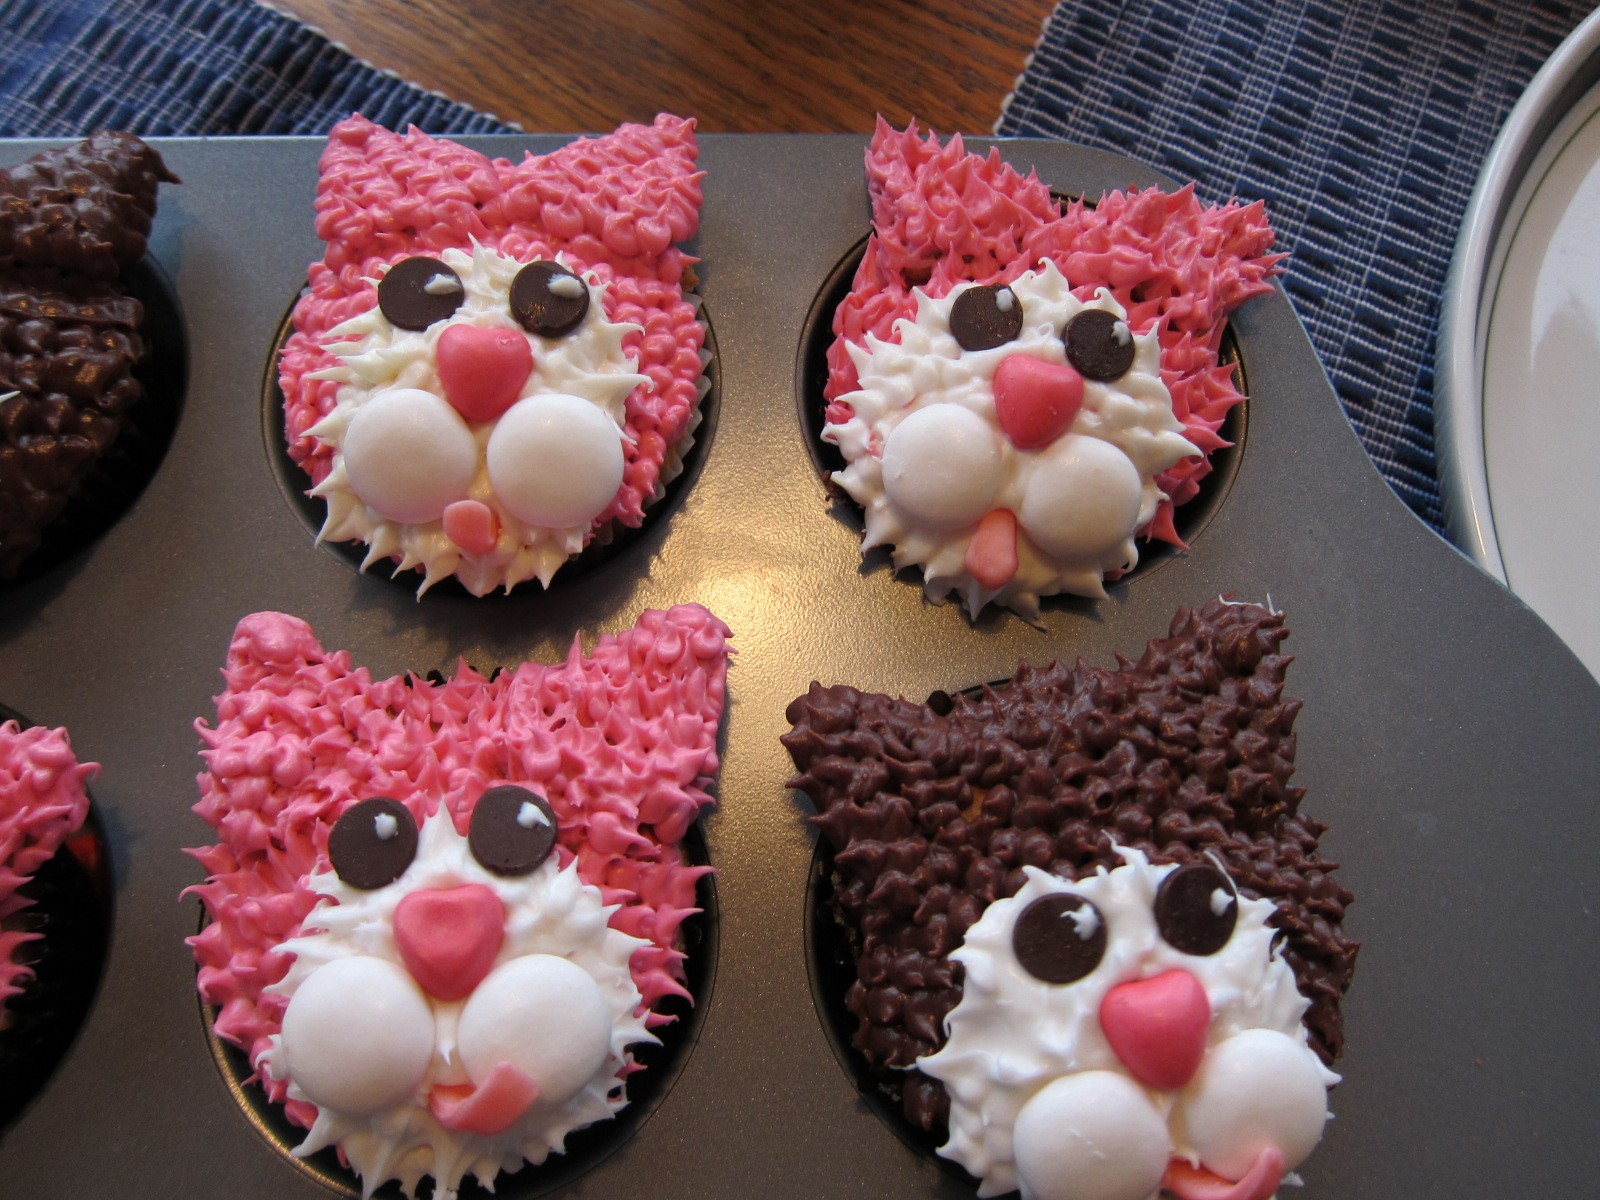 Meet the kitties! We decided to alternate between pink and brown fur ...